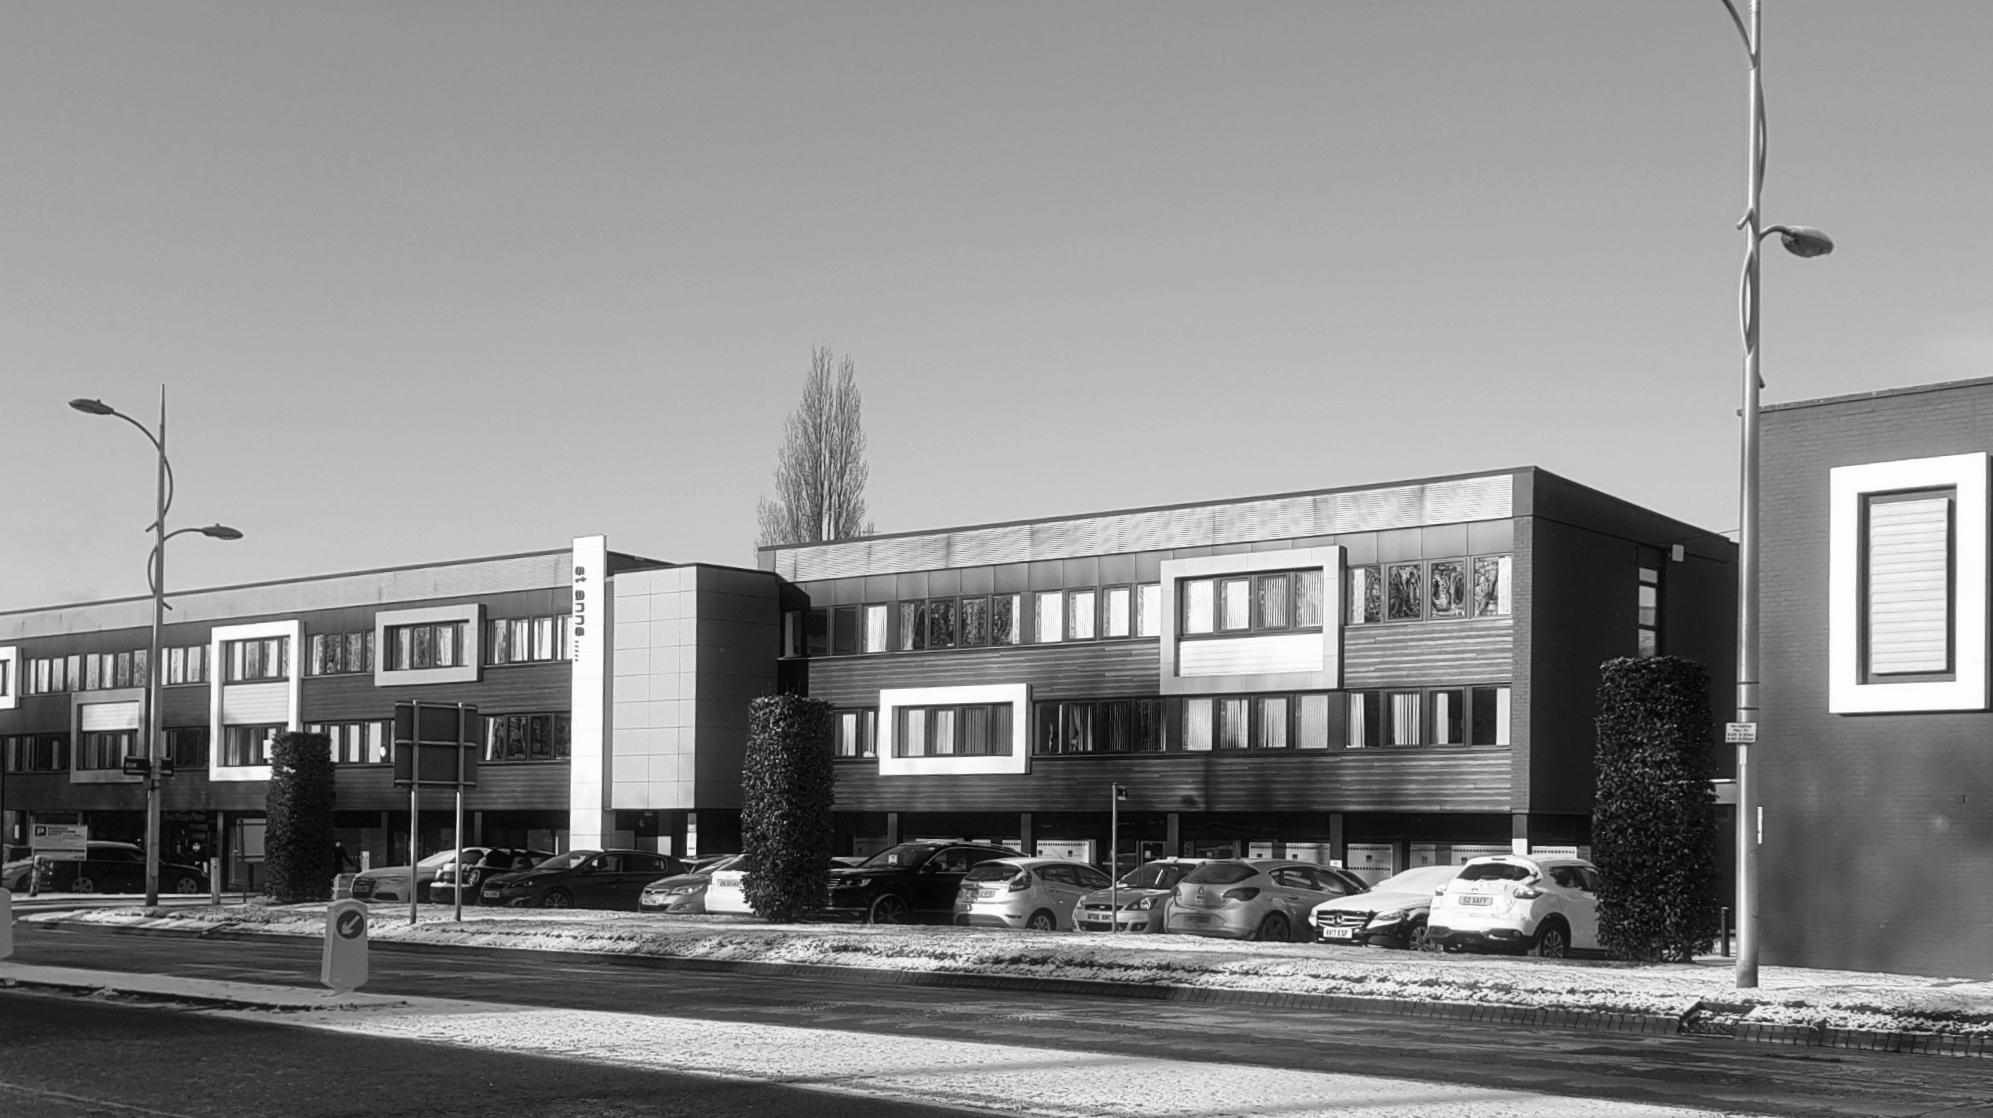 S&G Response Building HQ